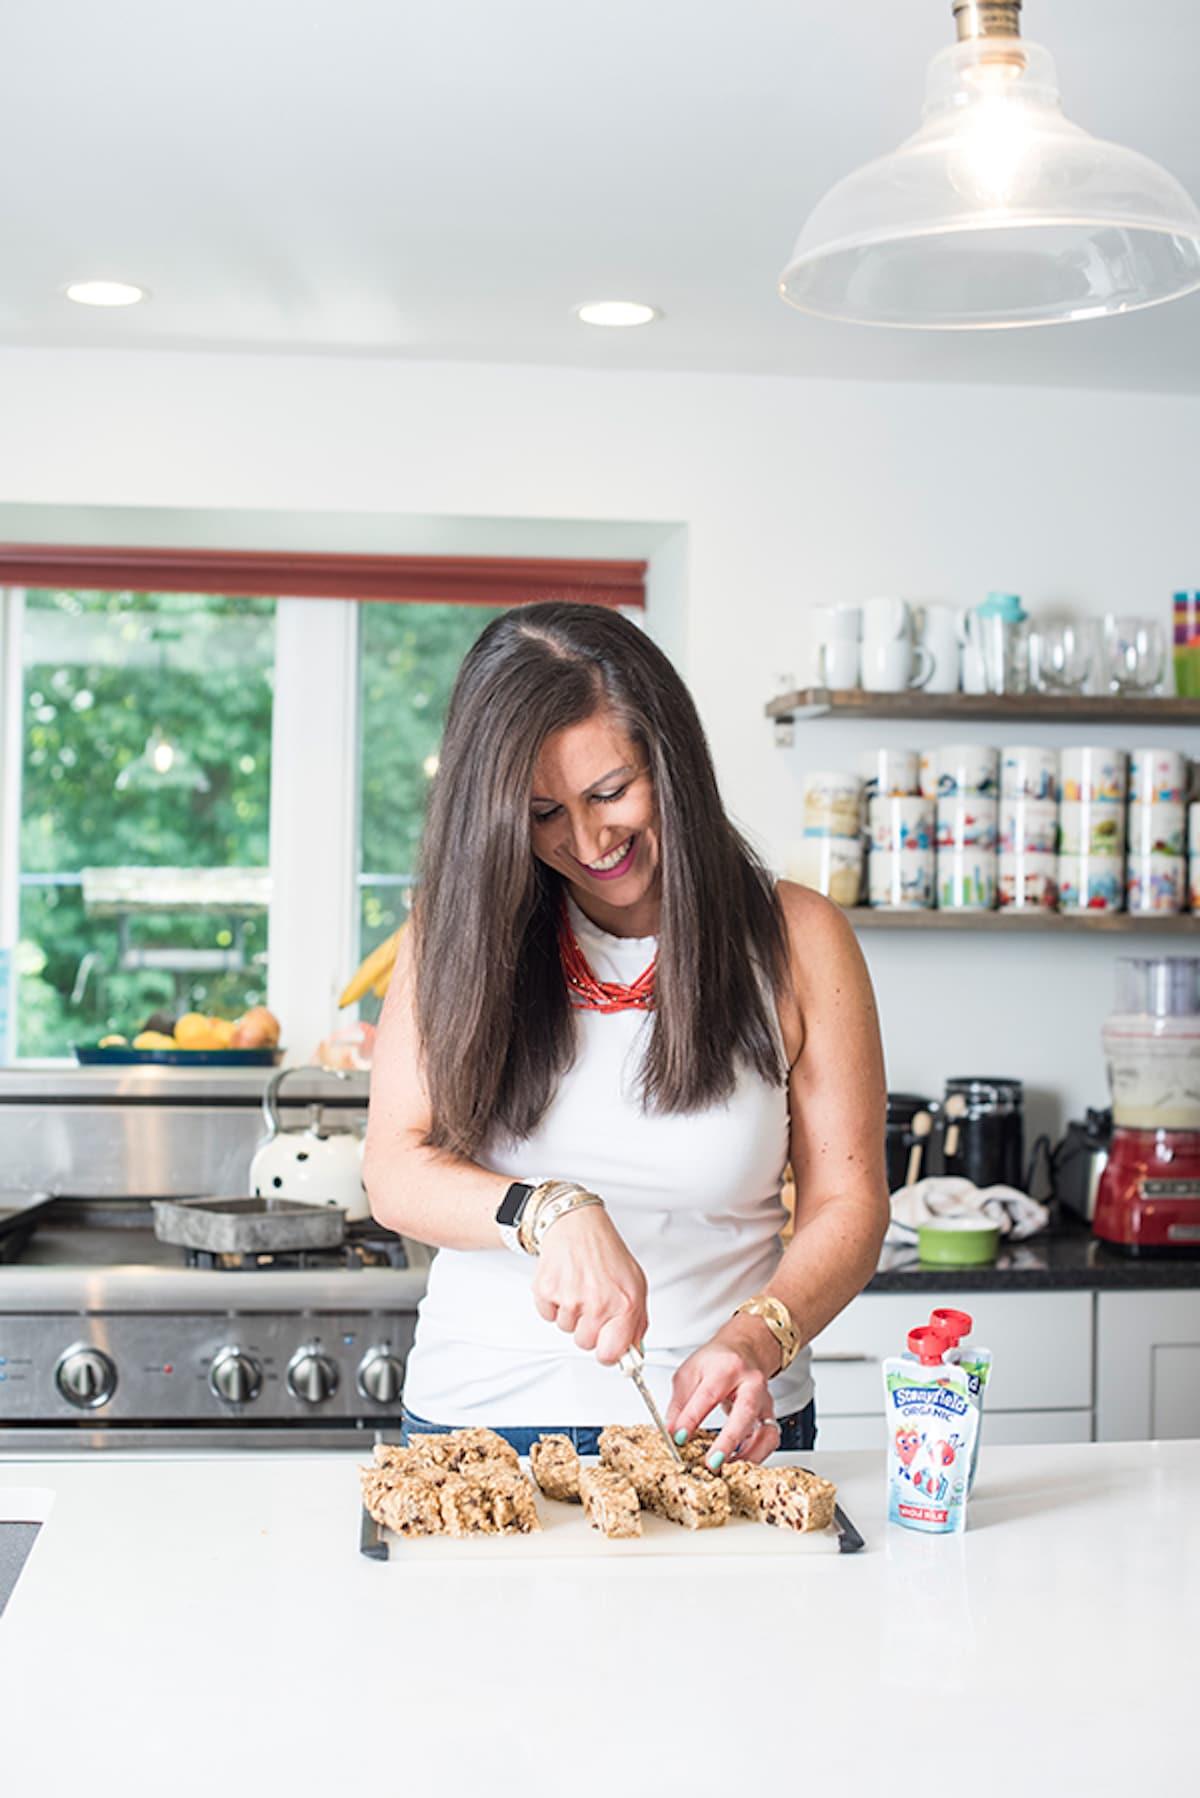 Liz cutting granola bars